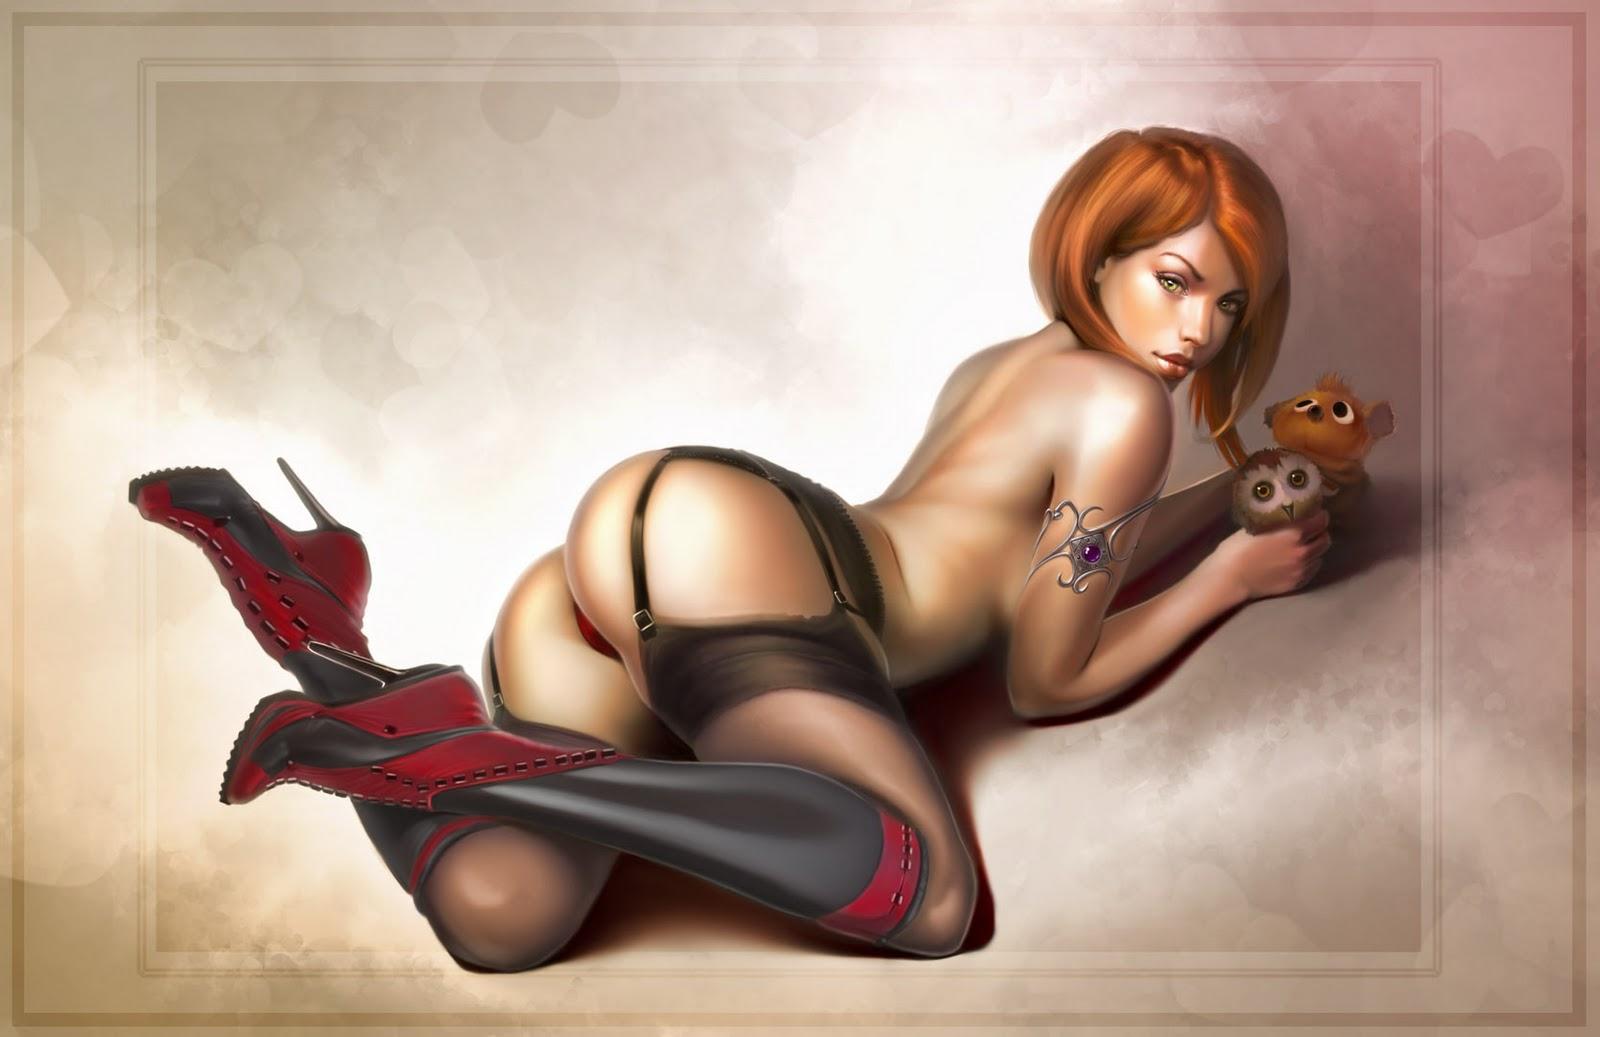 http://4.bp.blogspot.com/_Y5-4Z4aPcOI/TT1N5Kukw6I/AAAAAAAAAsE/_dFhEqdx60Y/s1600/Best+HD+Walls+-+FreeHD.Blogspot+%252812%2529.jpg